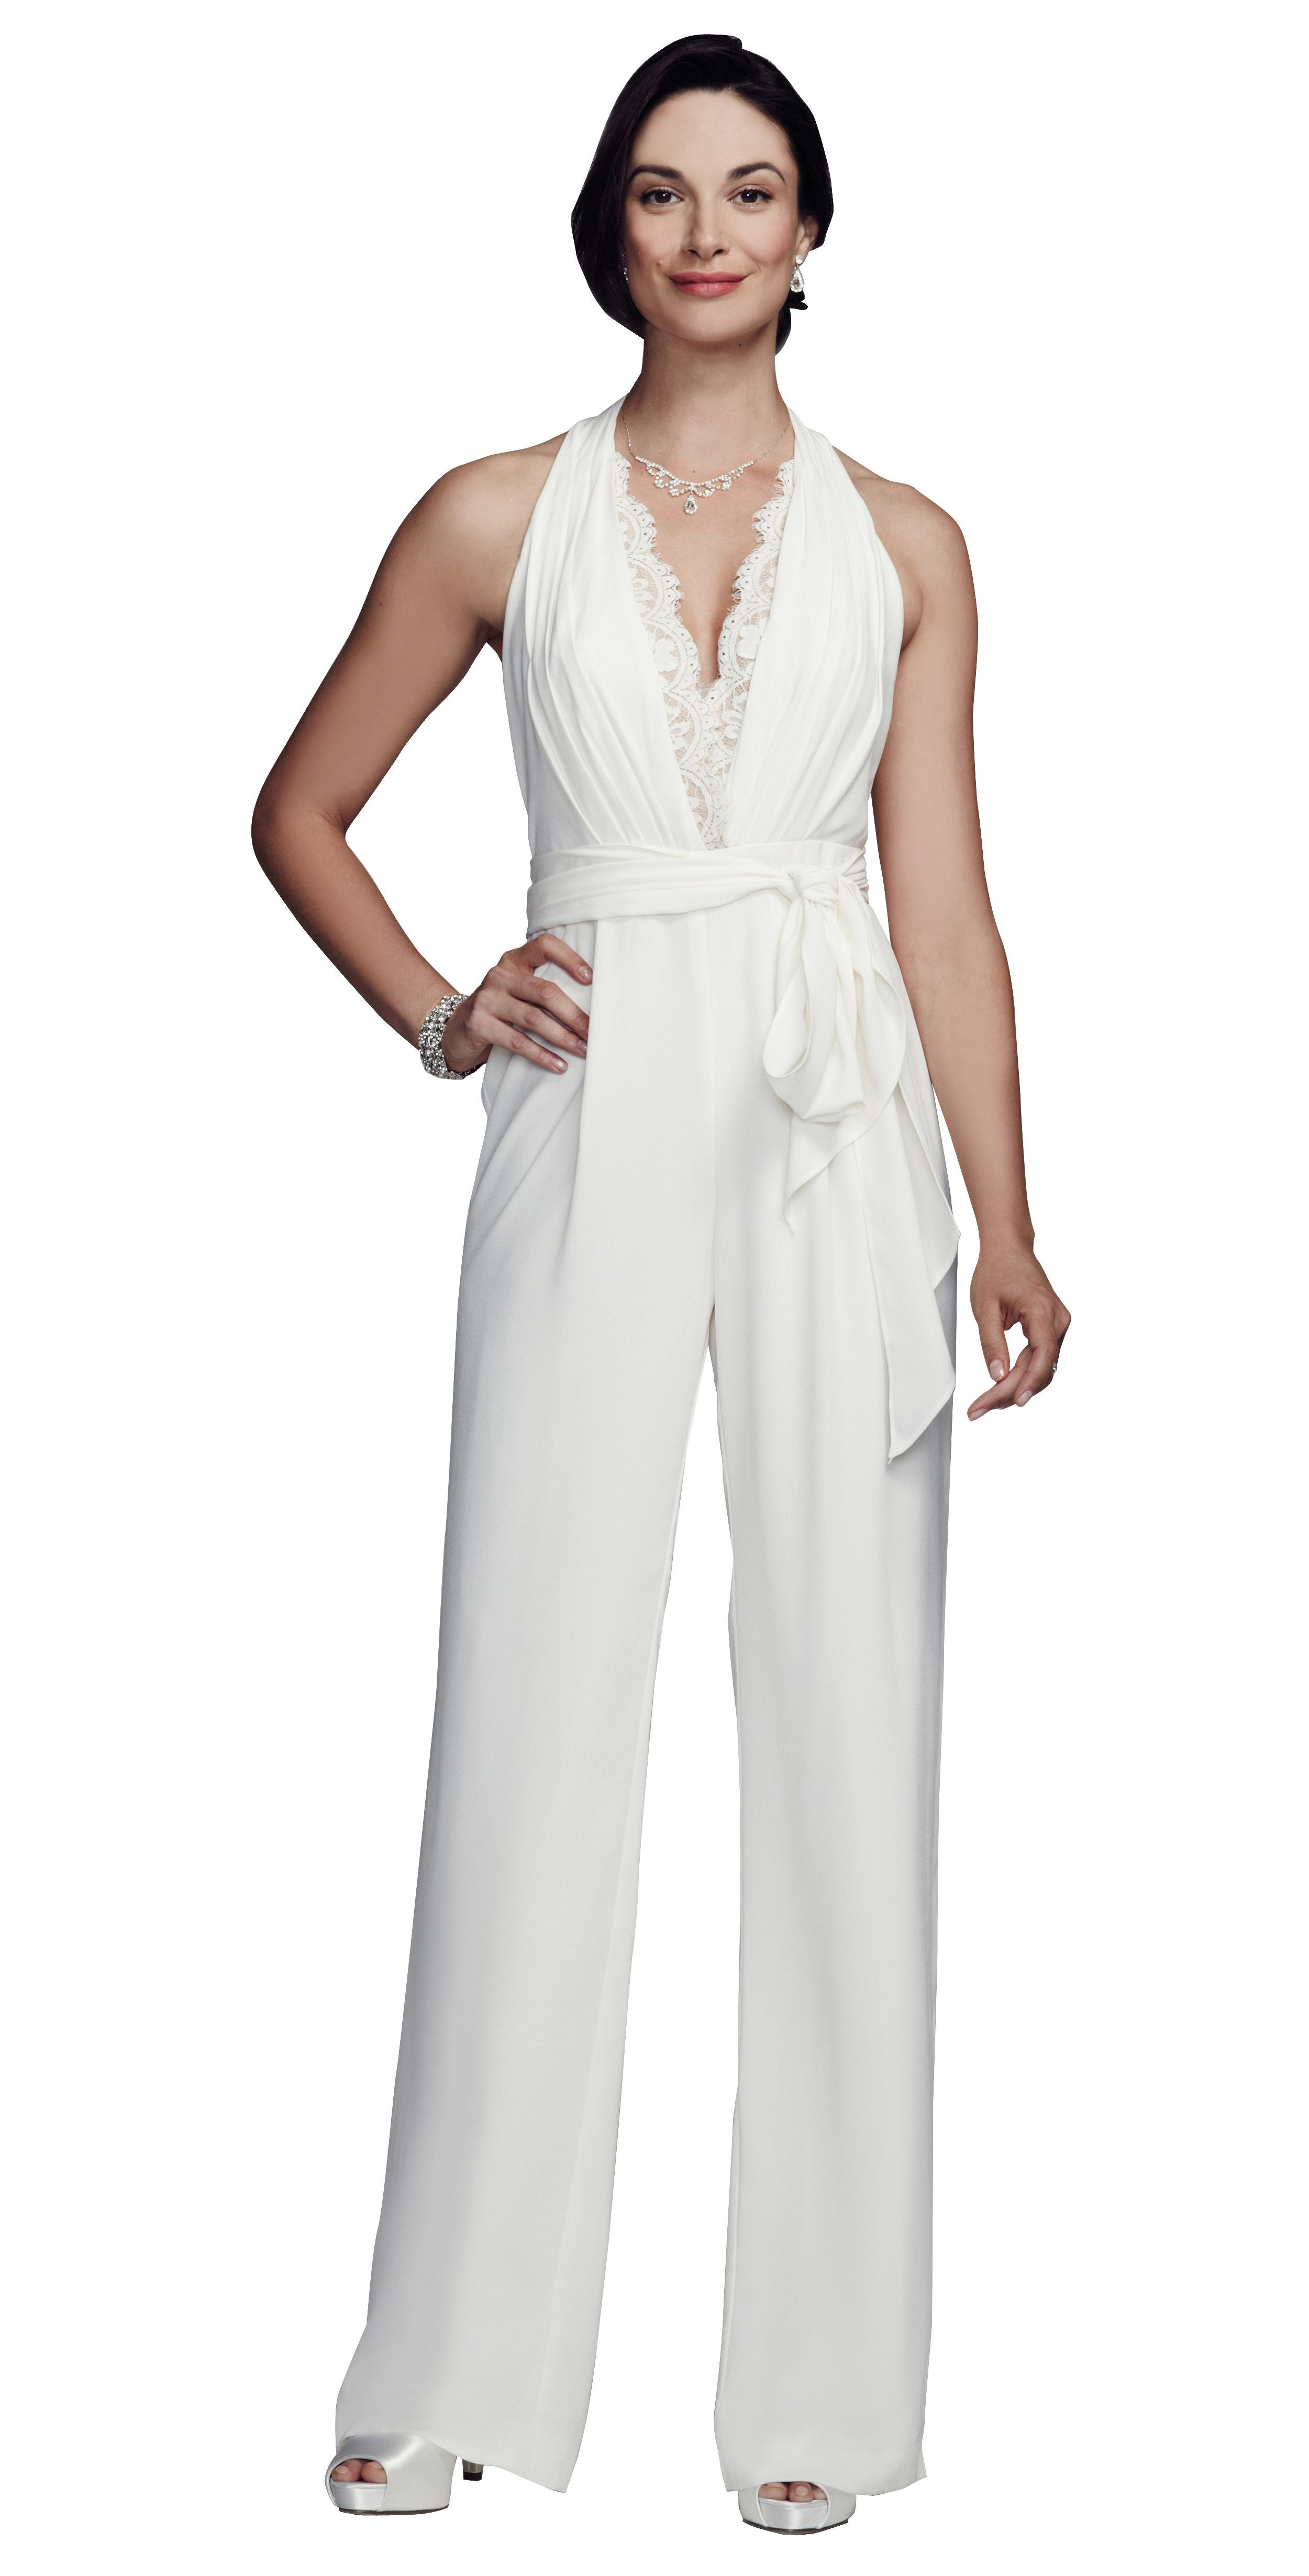 995f2c439045 12 wedding dress trends to love